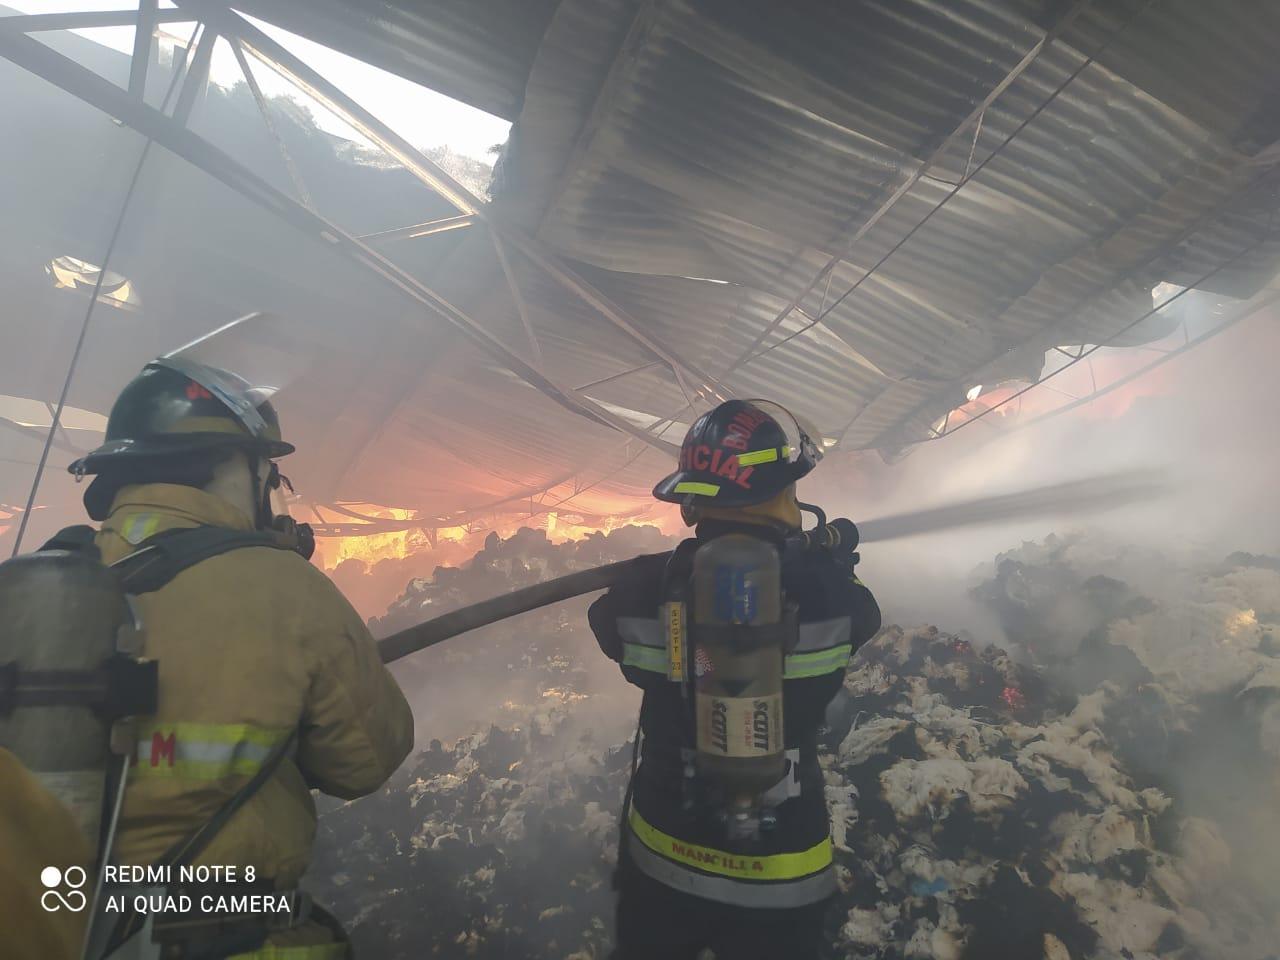 Al sofocar incendio bombero cae de segundo piso en San Andrés Cholula